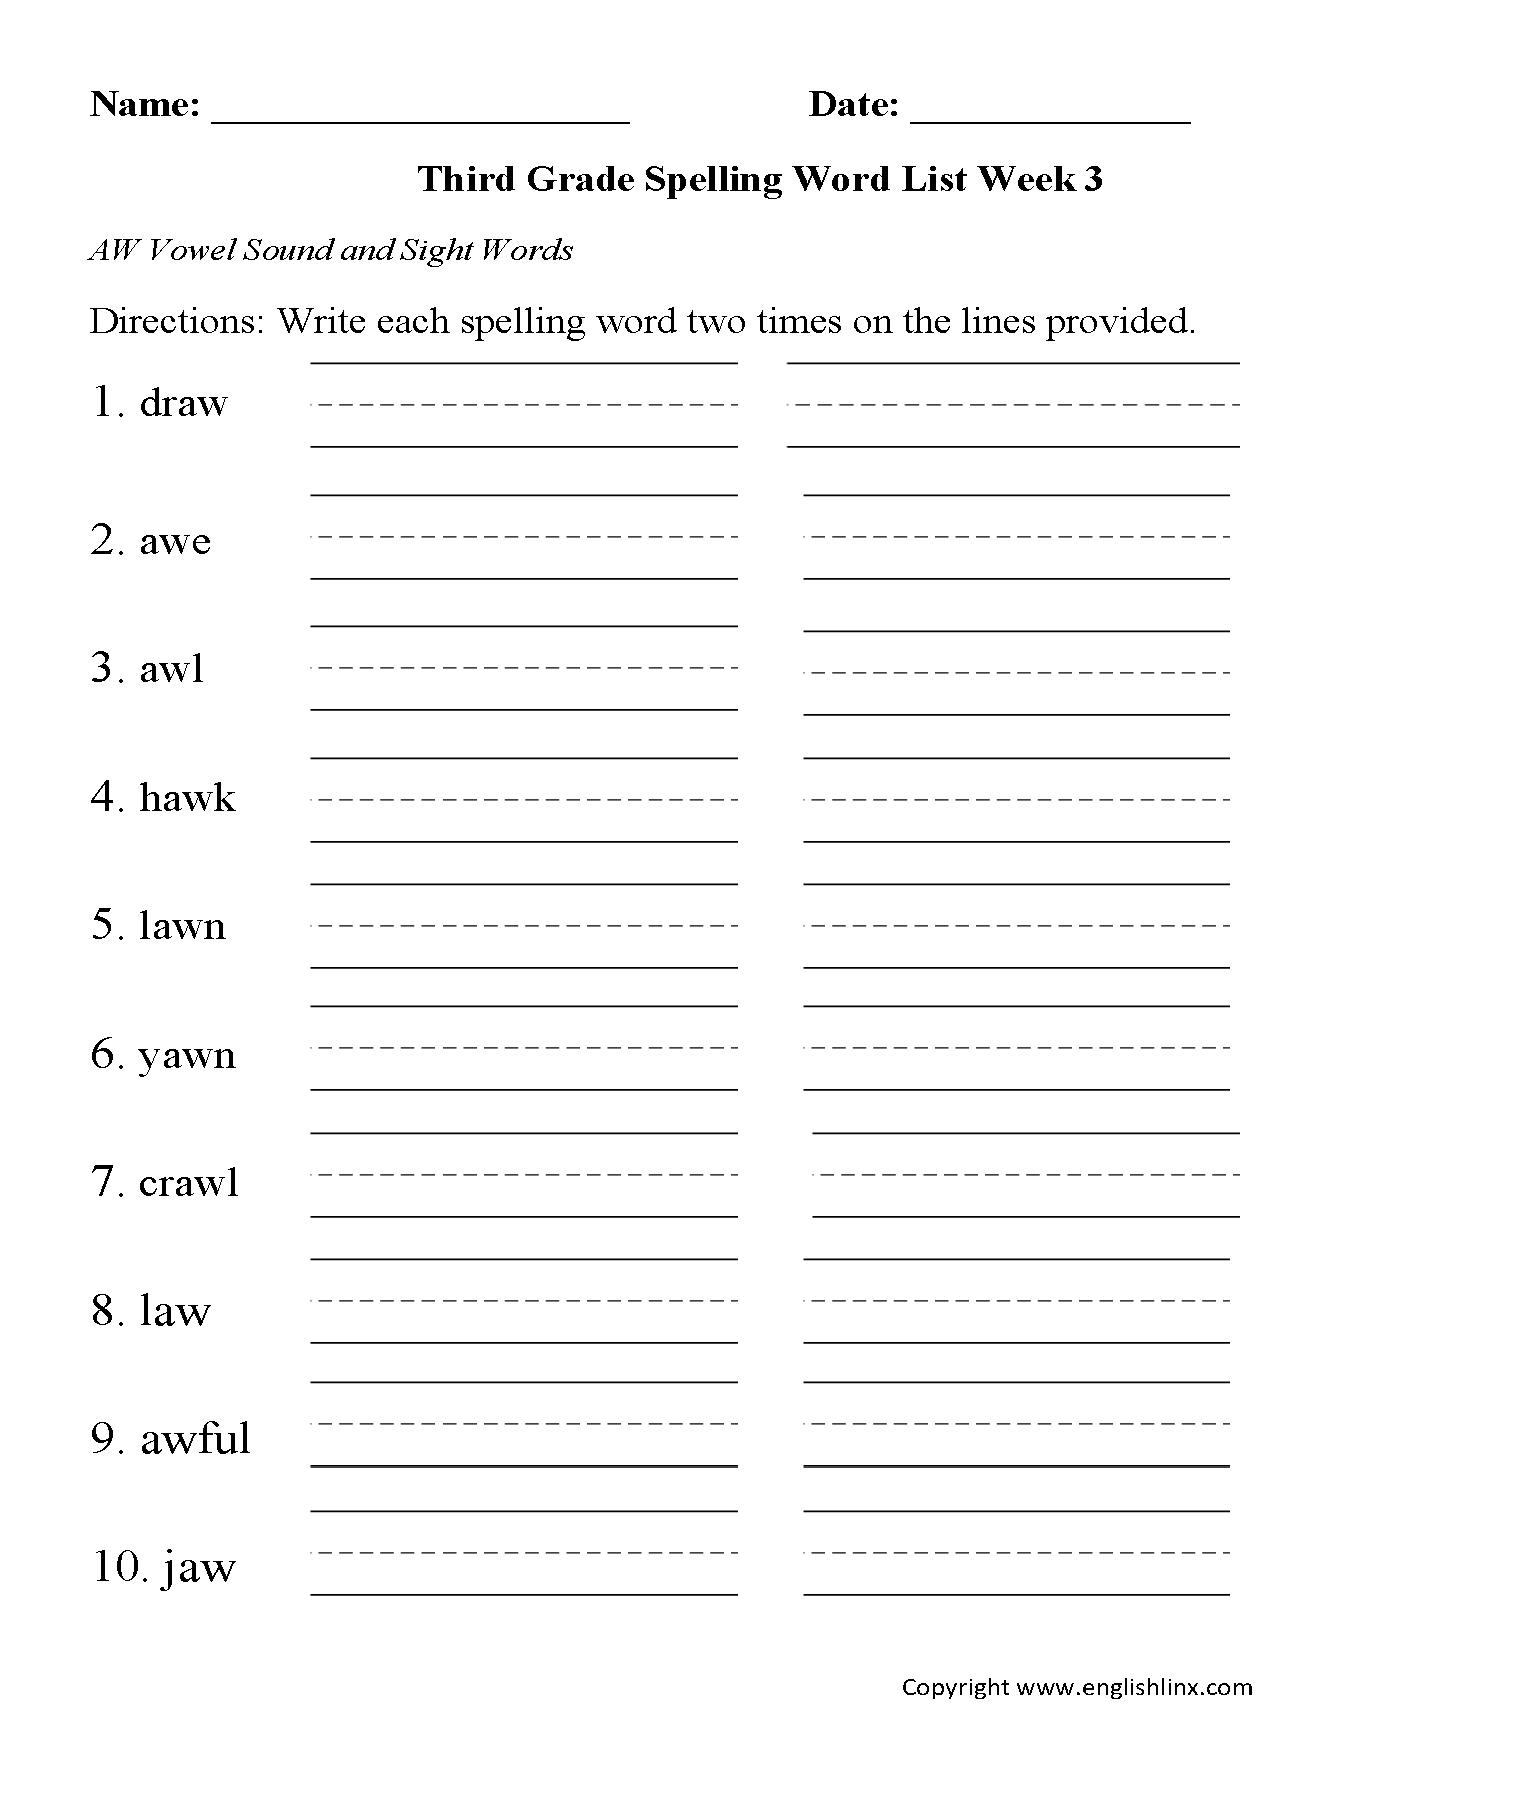 Spelling Worksheets | Third Grade Spelling Worksheets